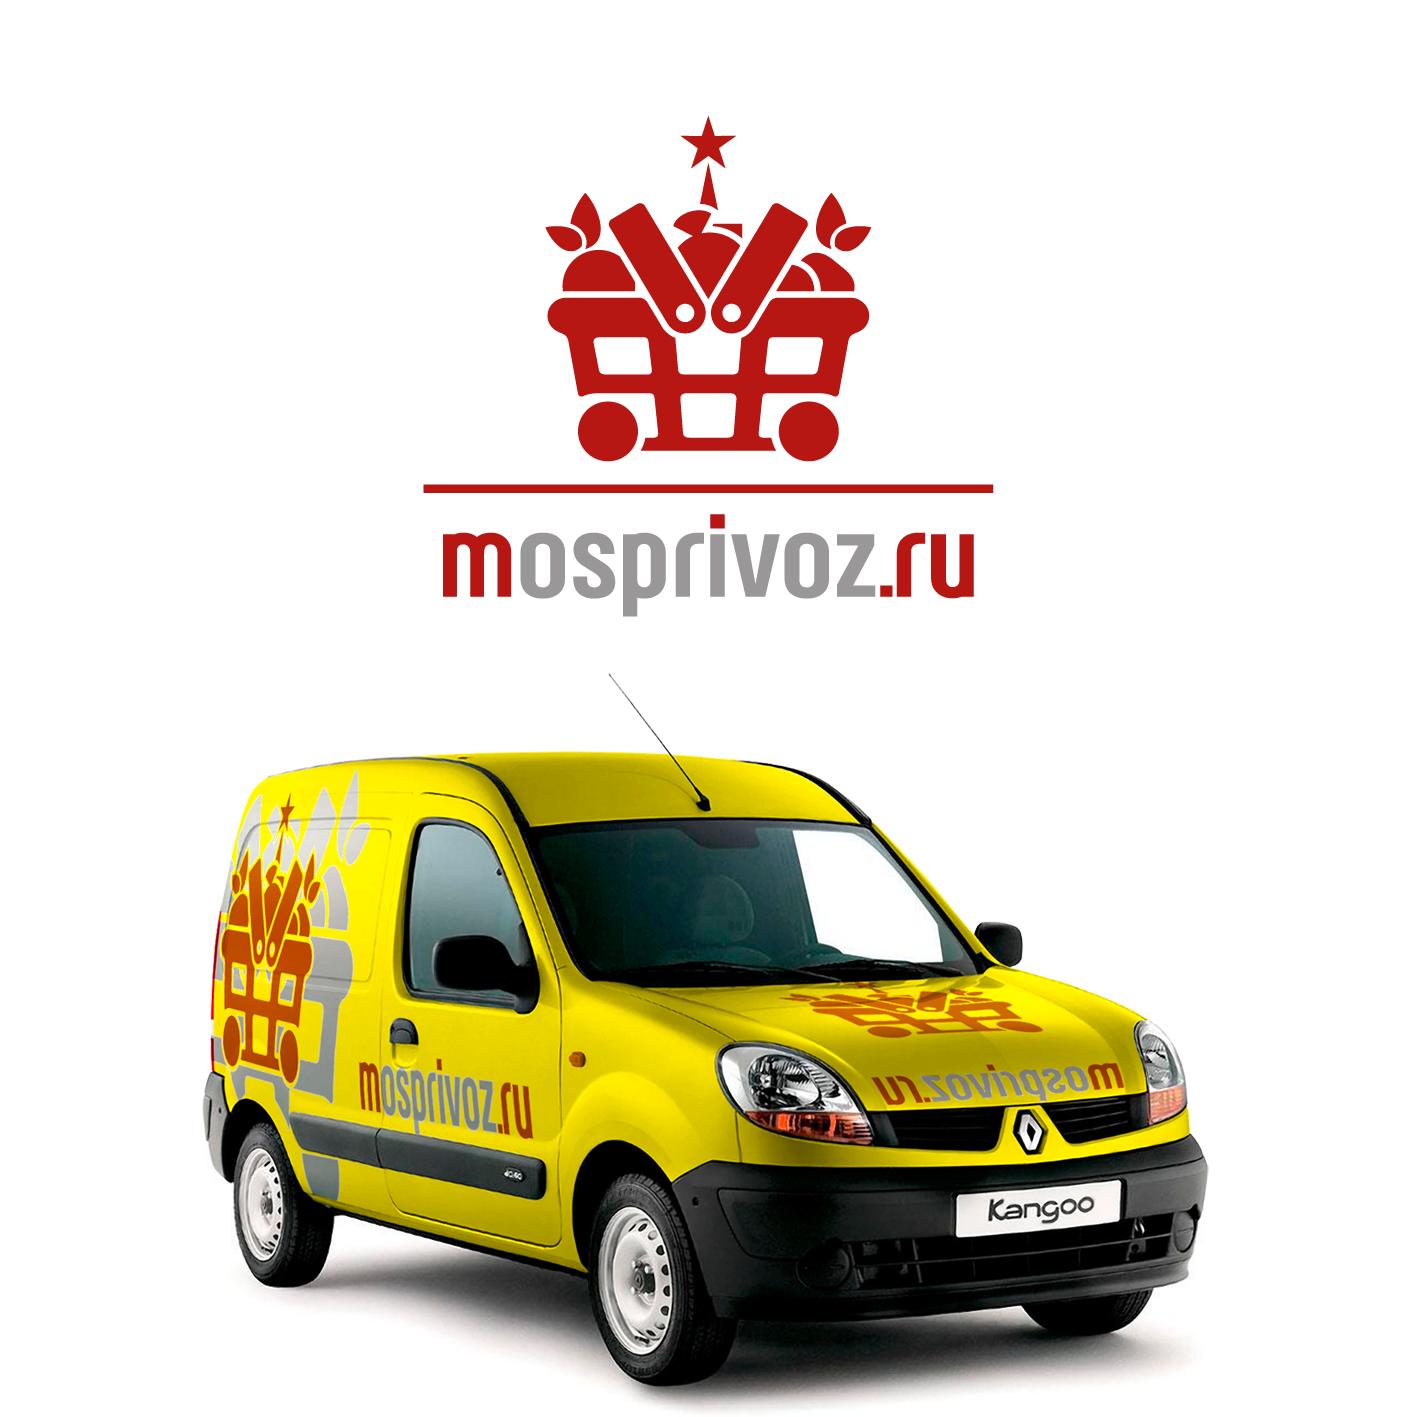 Логотип. Интернет - магазин по доставке продуктов питания. фото f_3195ad281d83c848.png